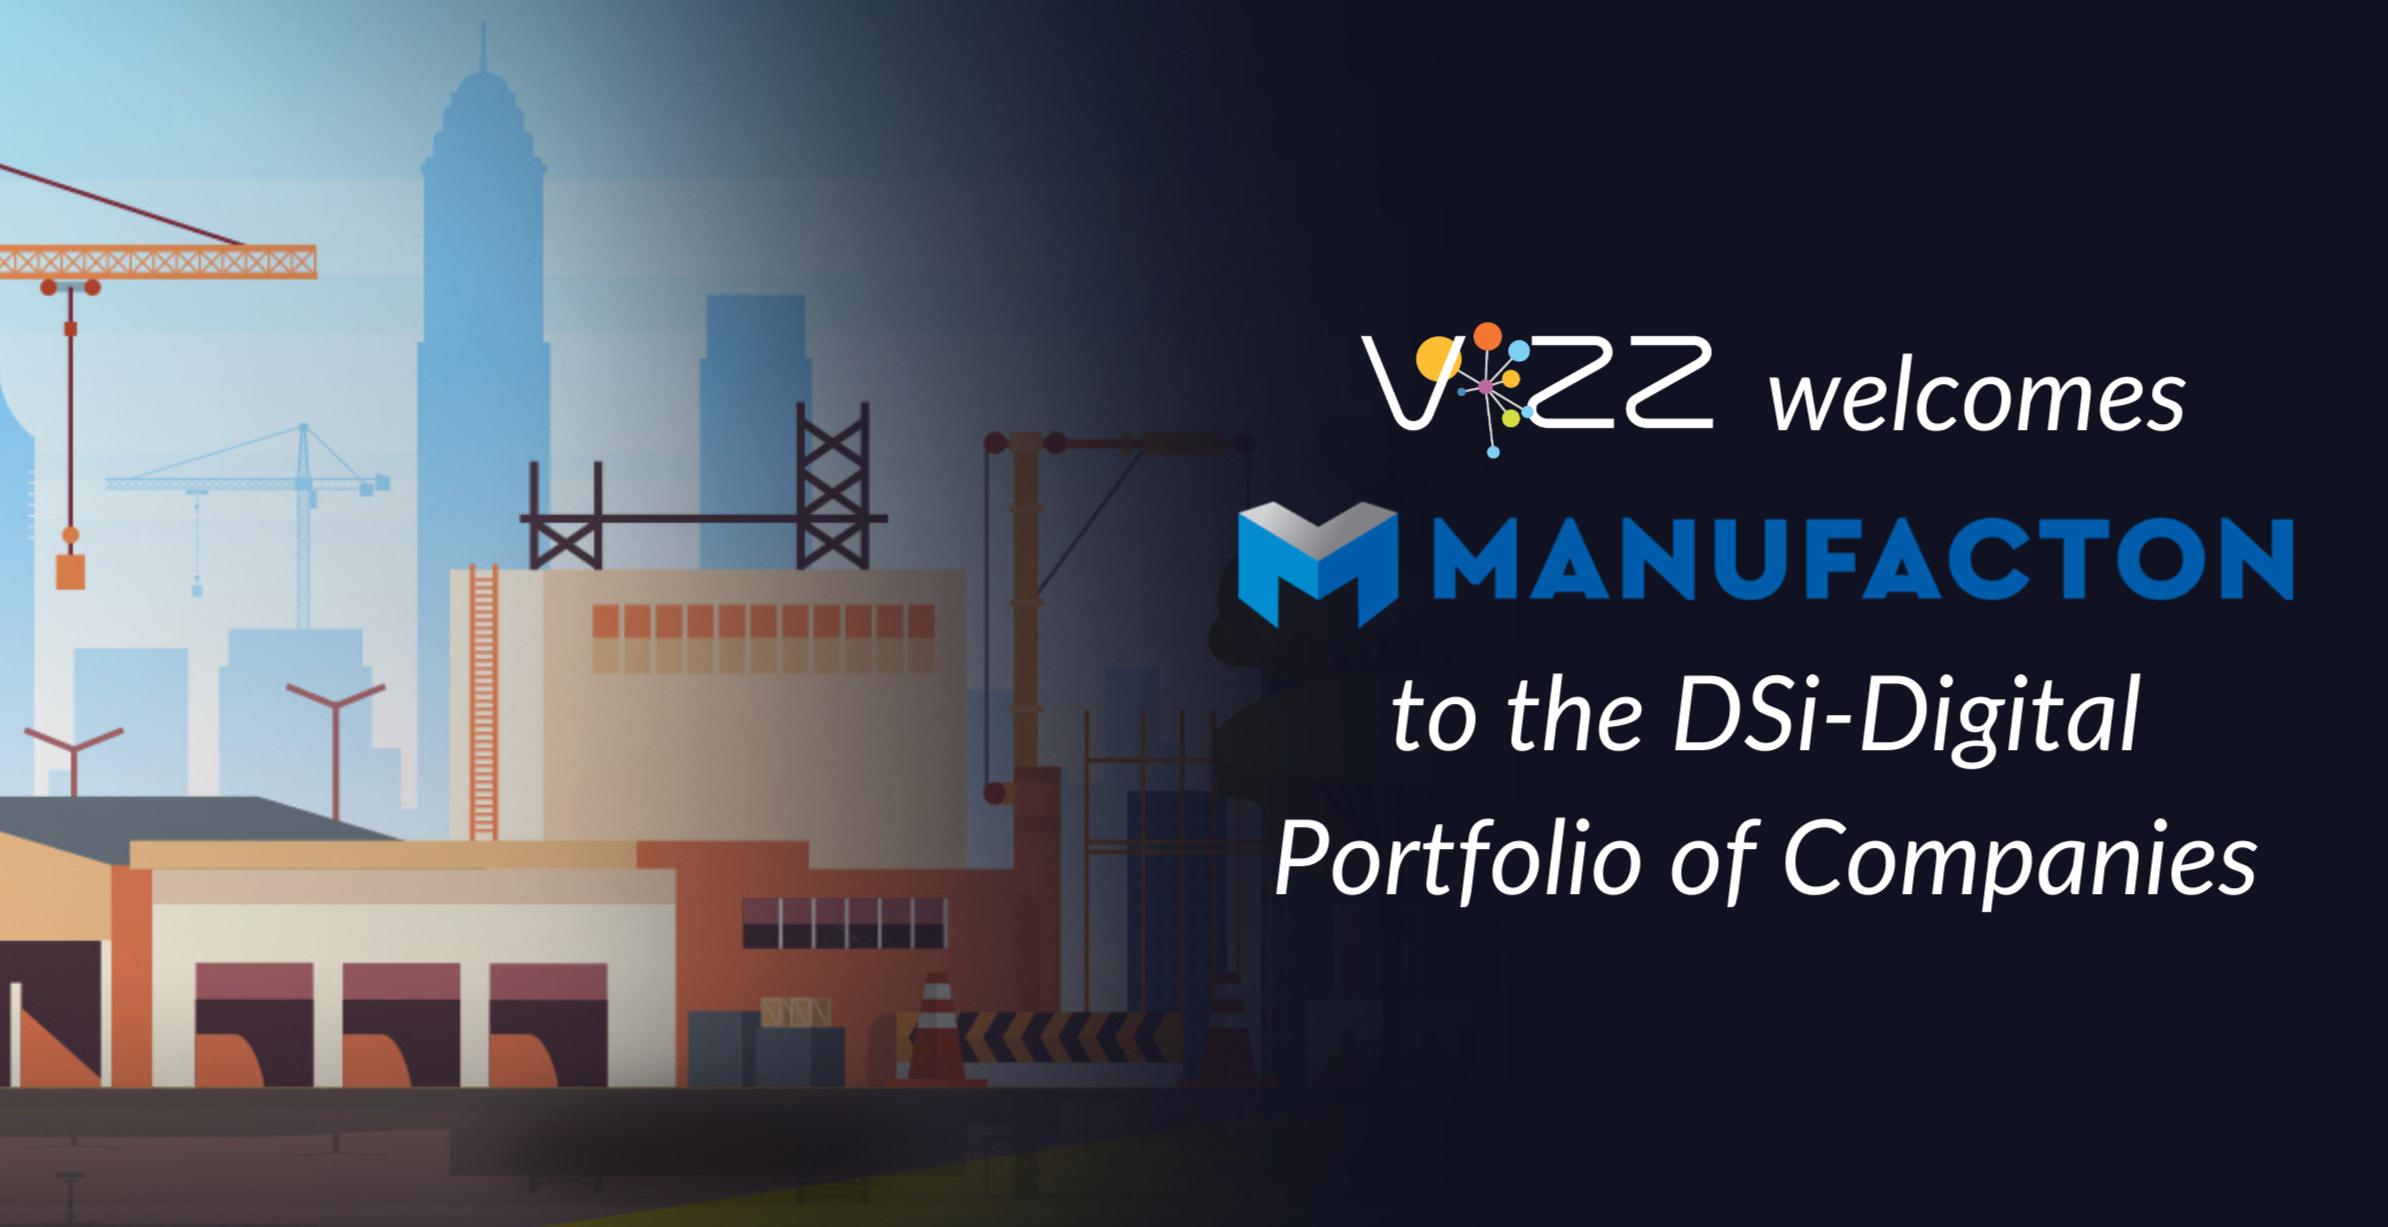 ViZZ Joins Manufacton